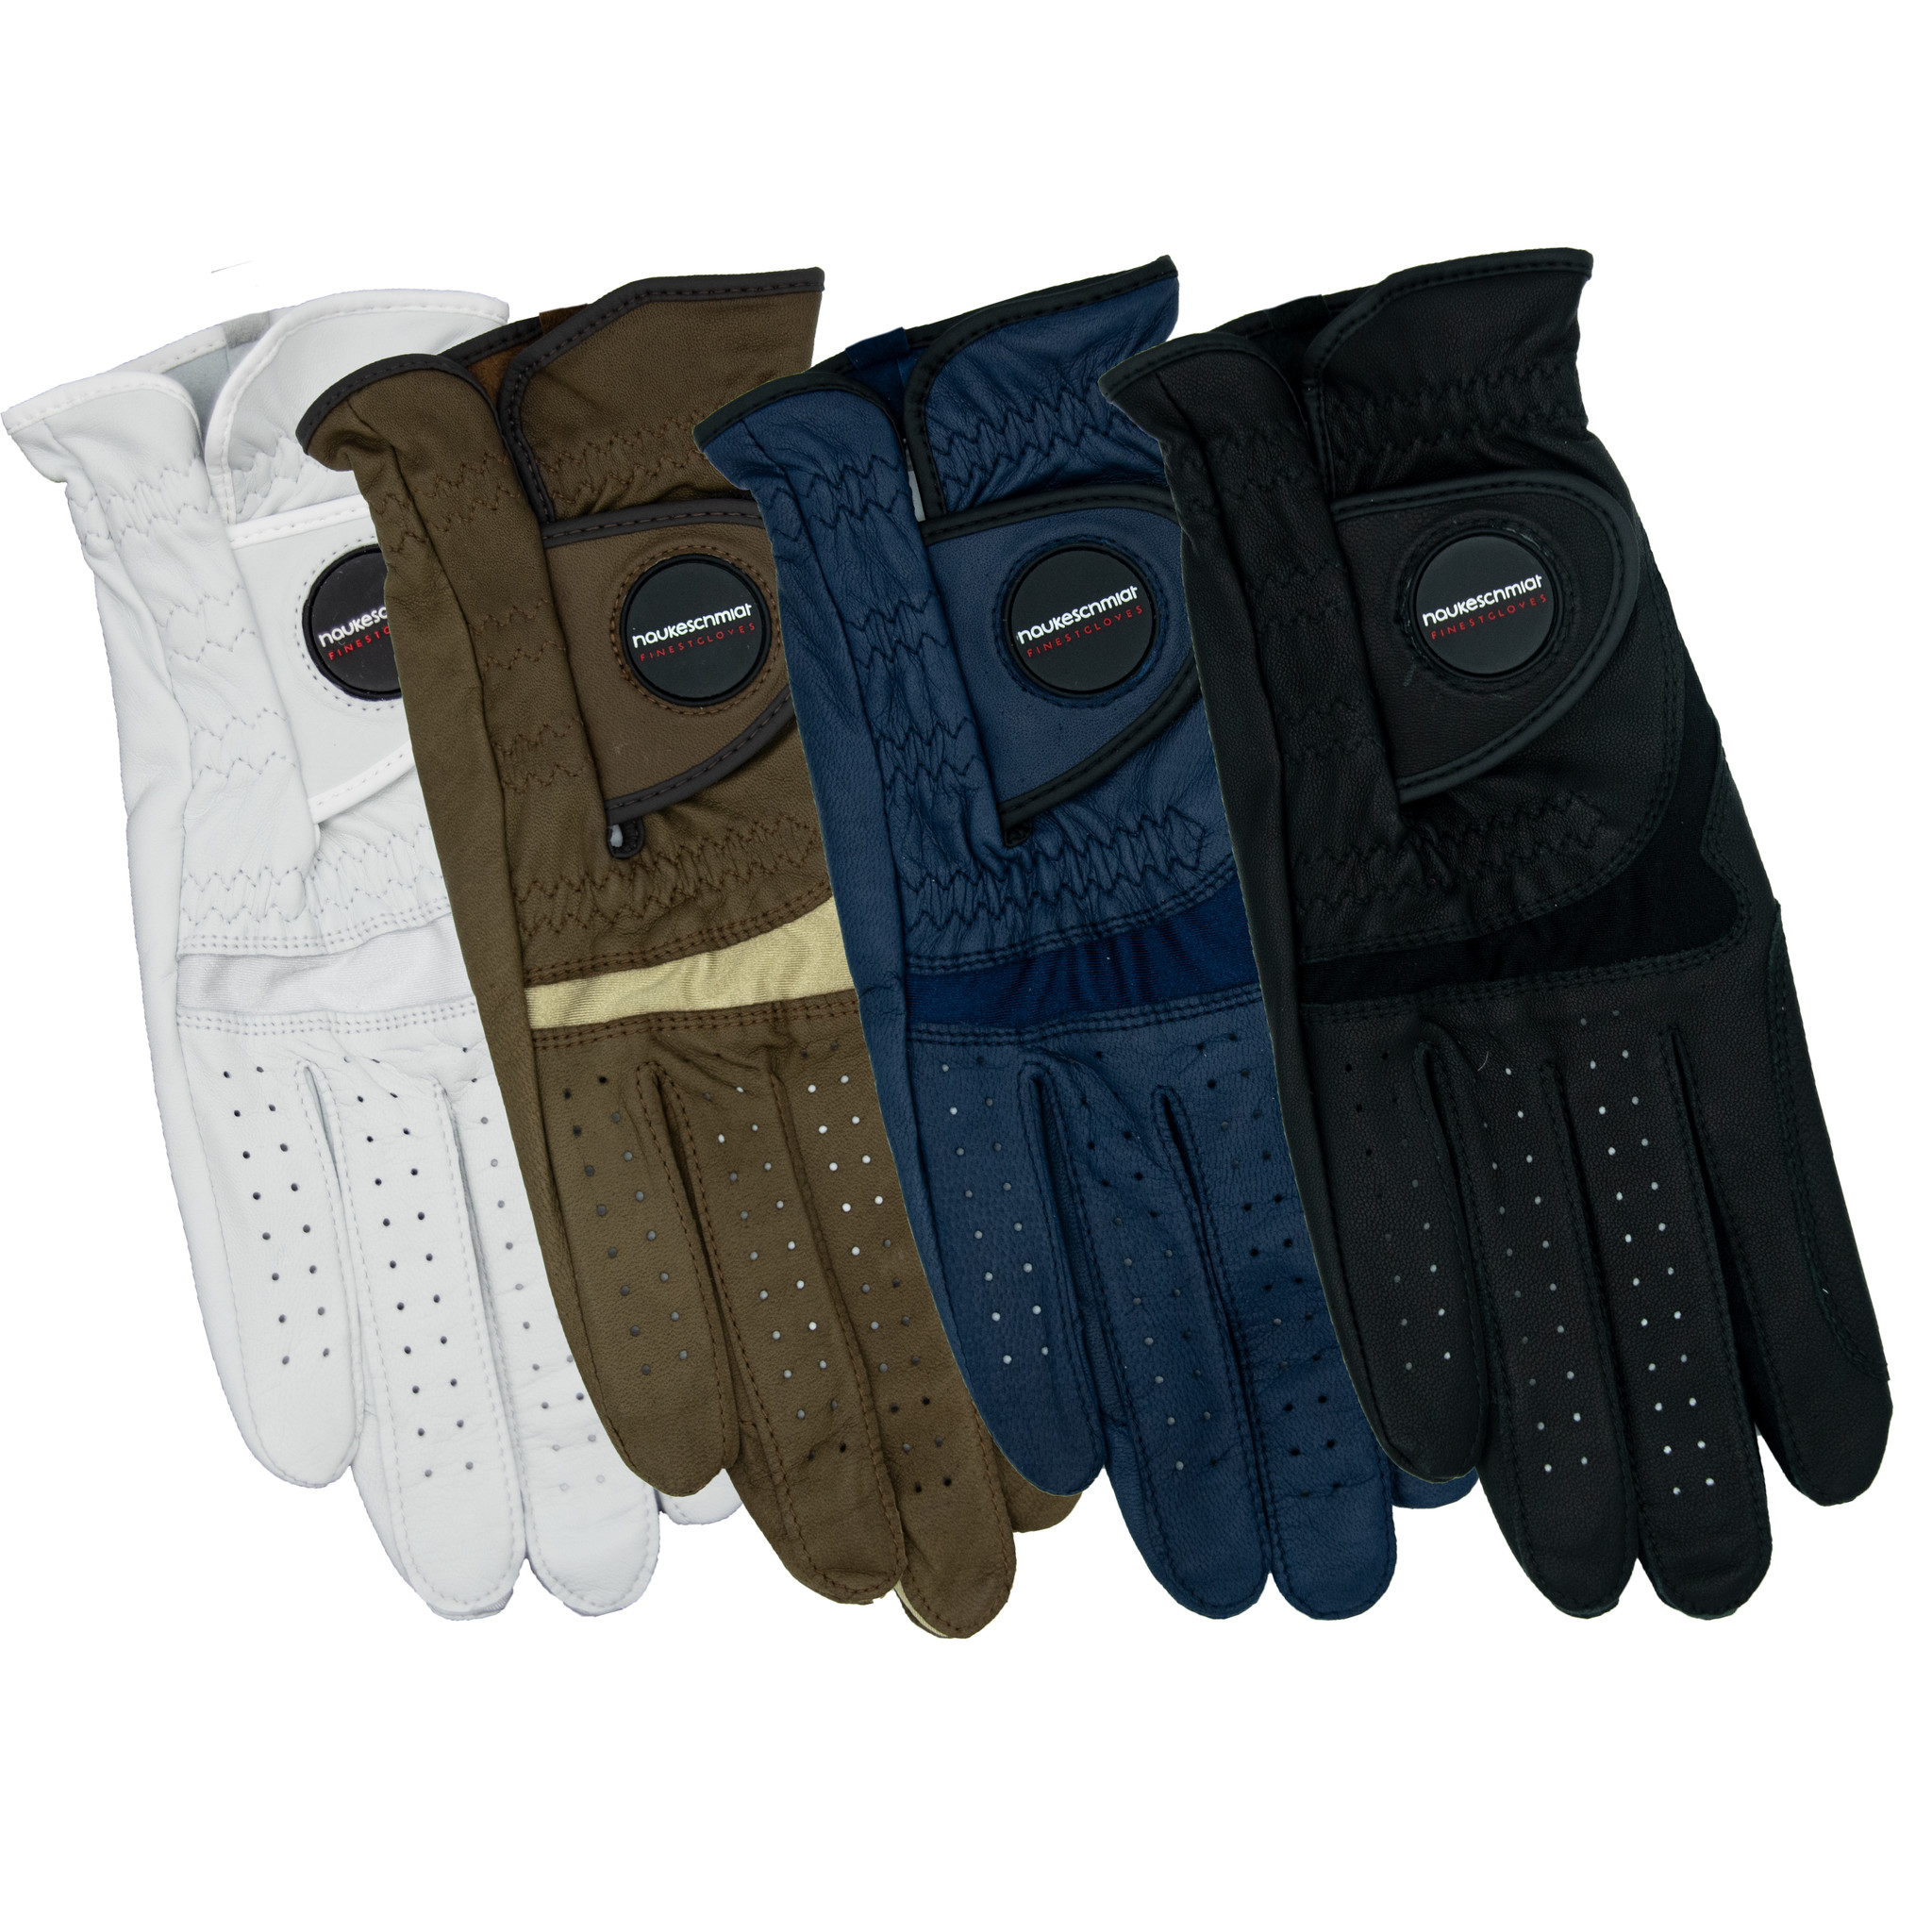 Handschoenen - Arabella - lamsleder